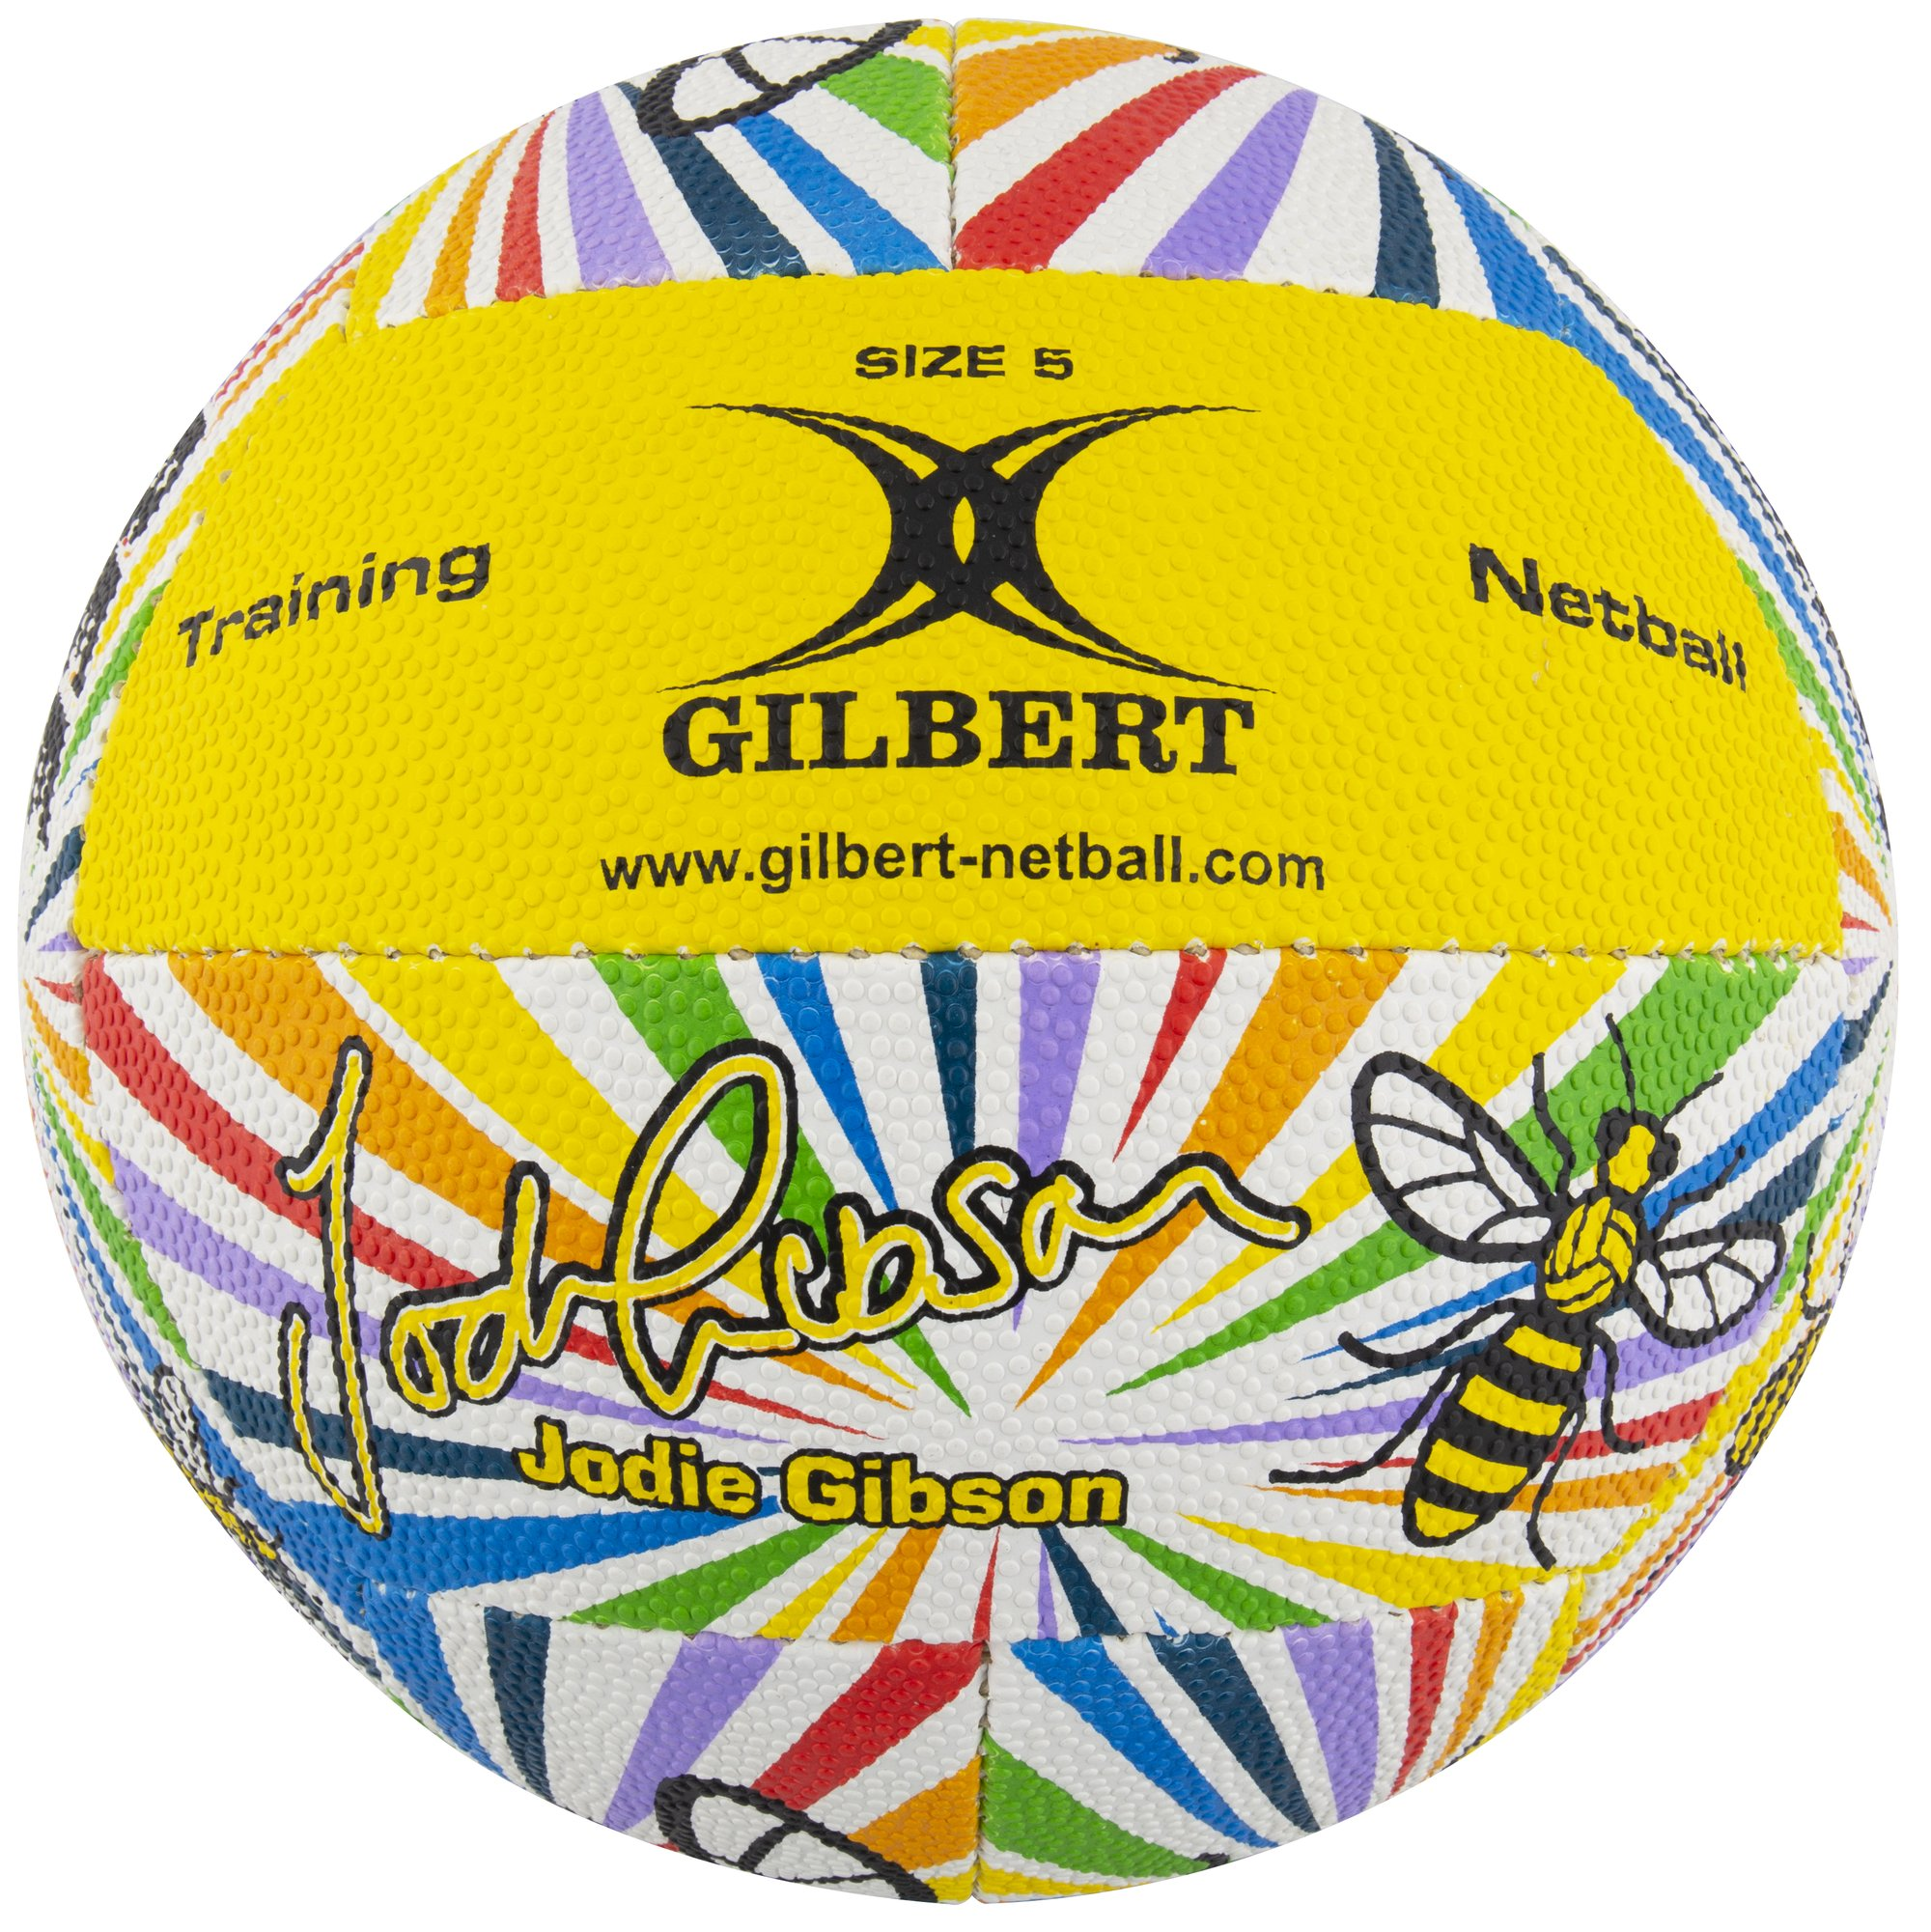 Jodie Gibson Signature Ball